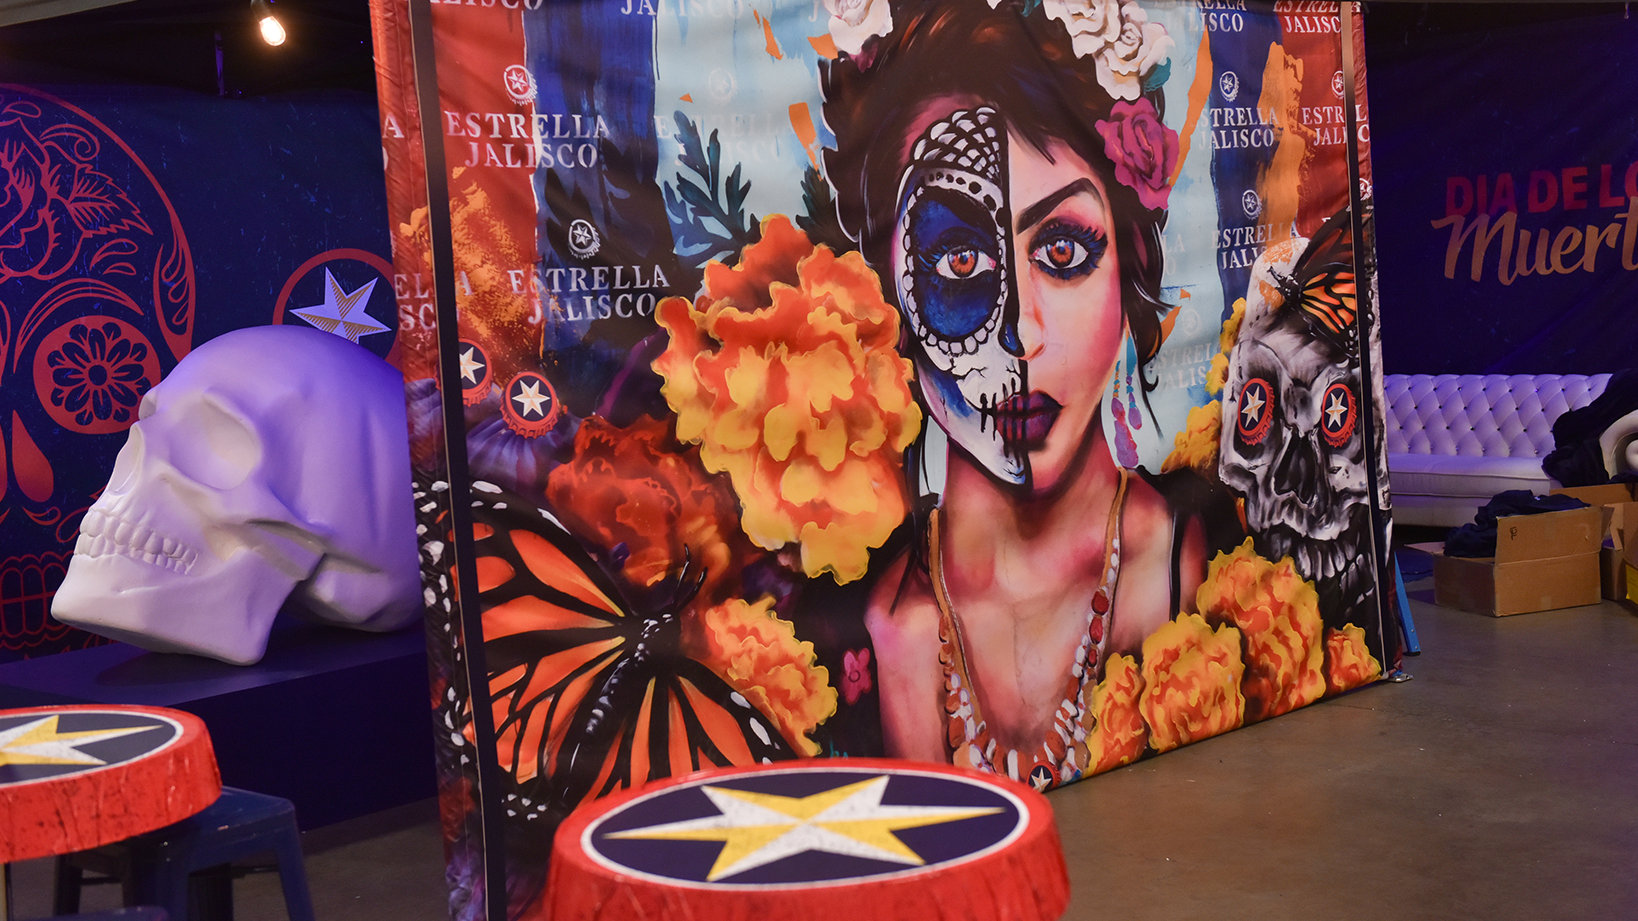 Estrella Jalisco Trade show booth